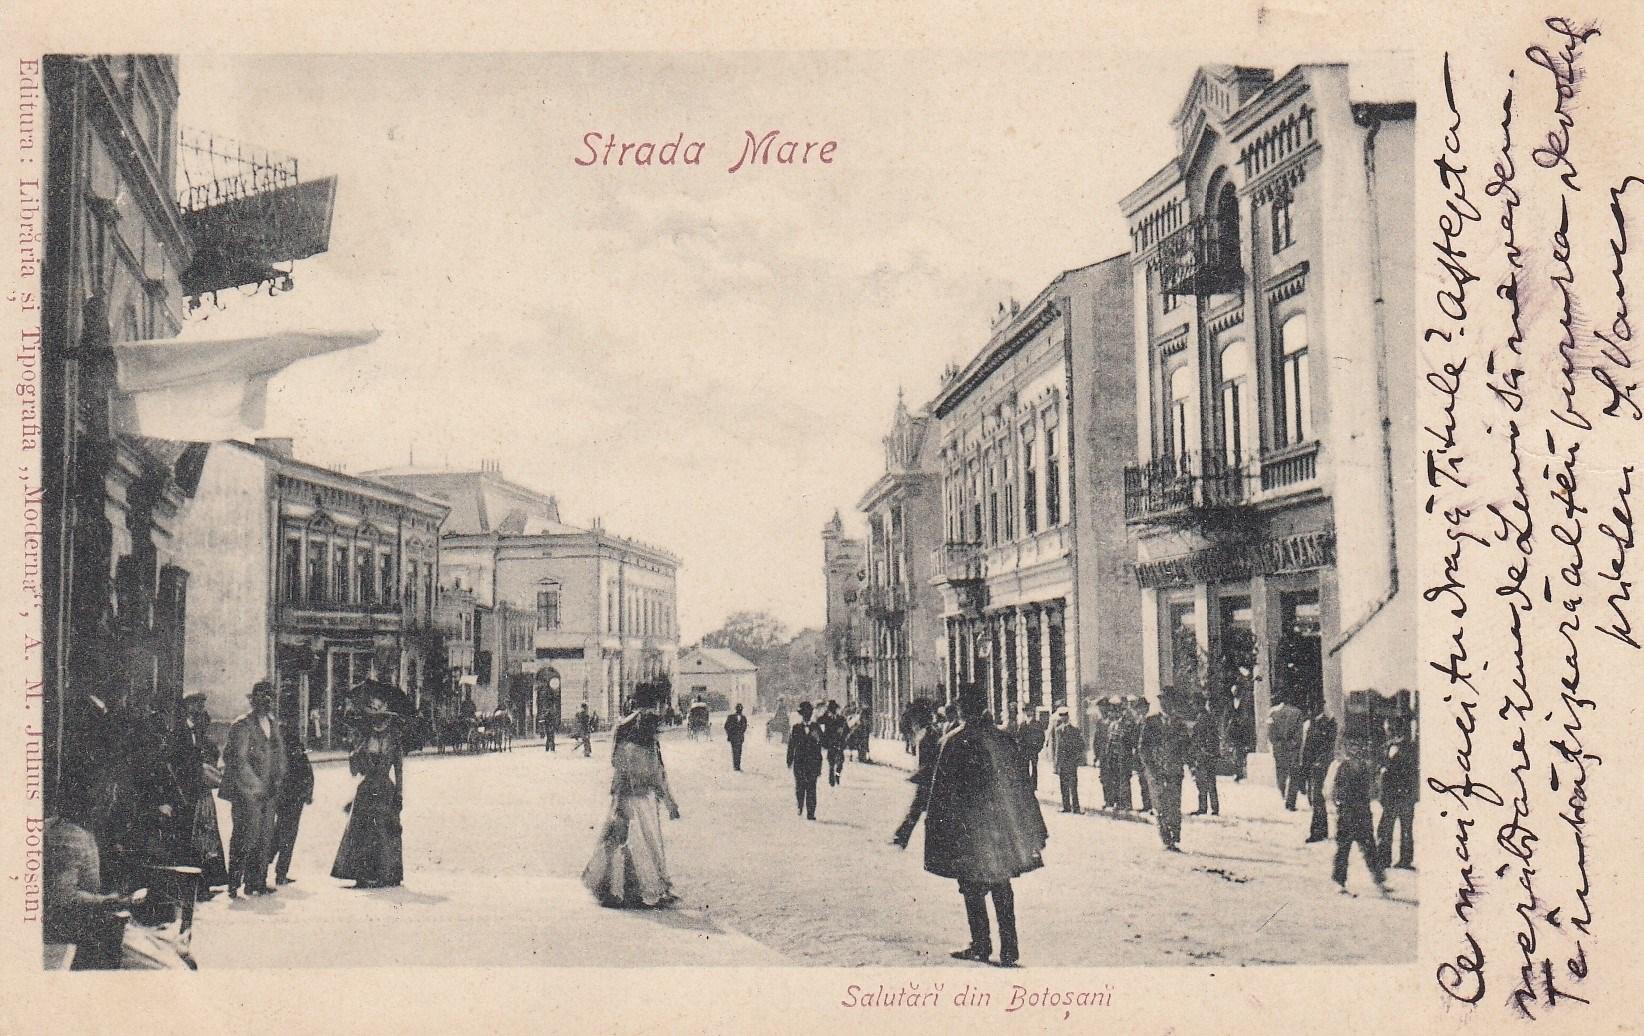 https://ahe-ro.s3.amazonaws.com/4502/Strada-Mare-din-Boto%C8%99ani-1902.jpg